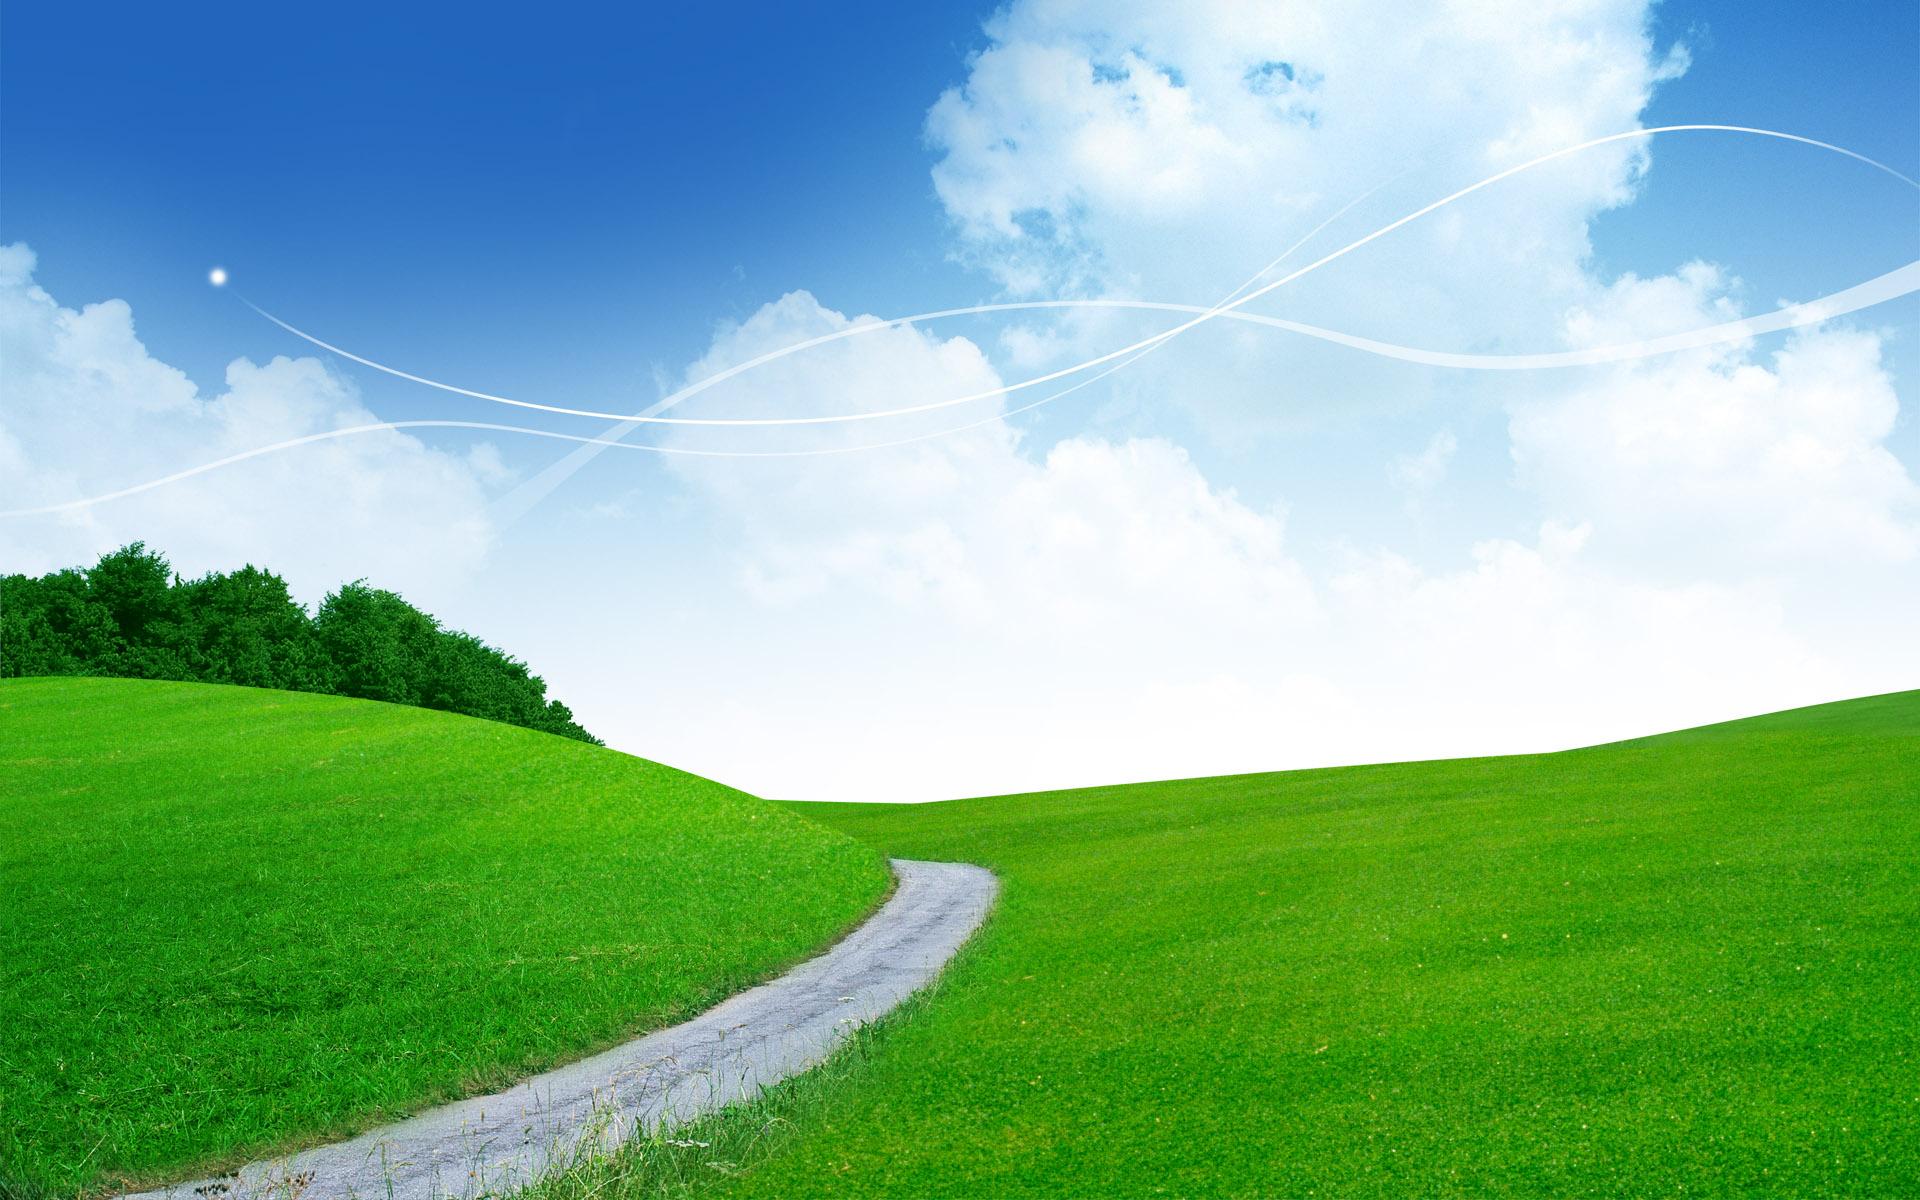 холм зелень лето небо без смс